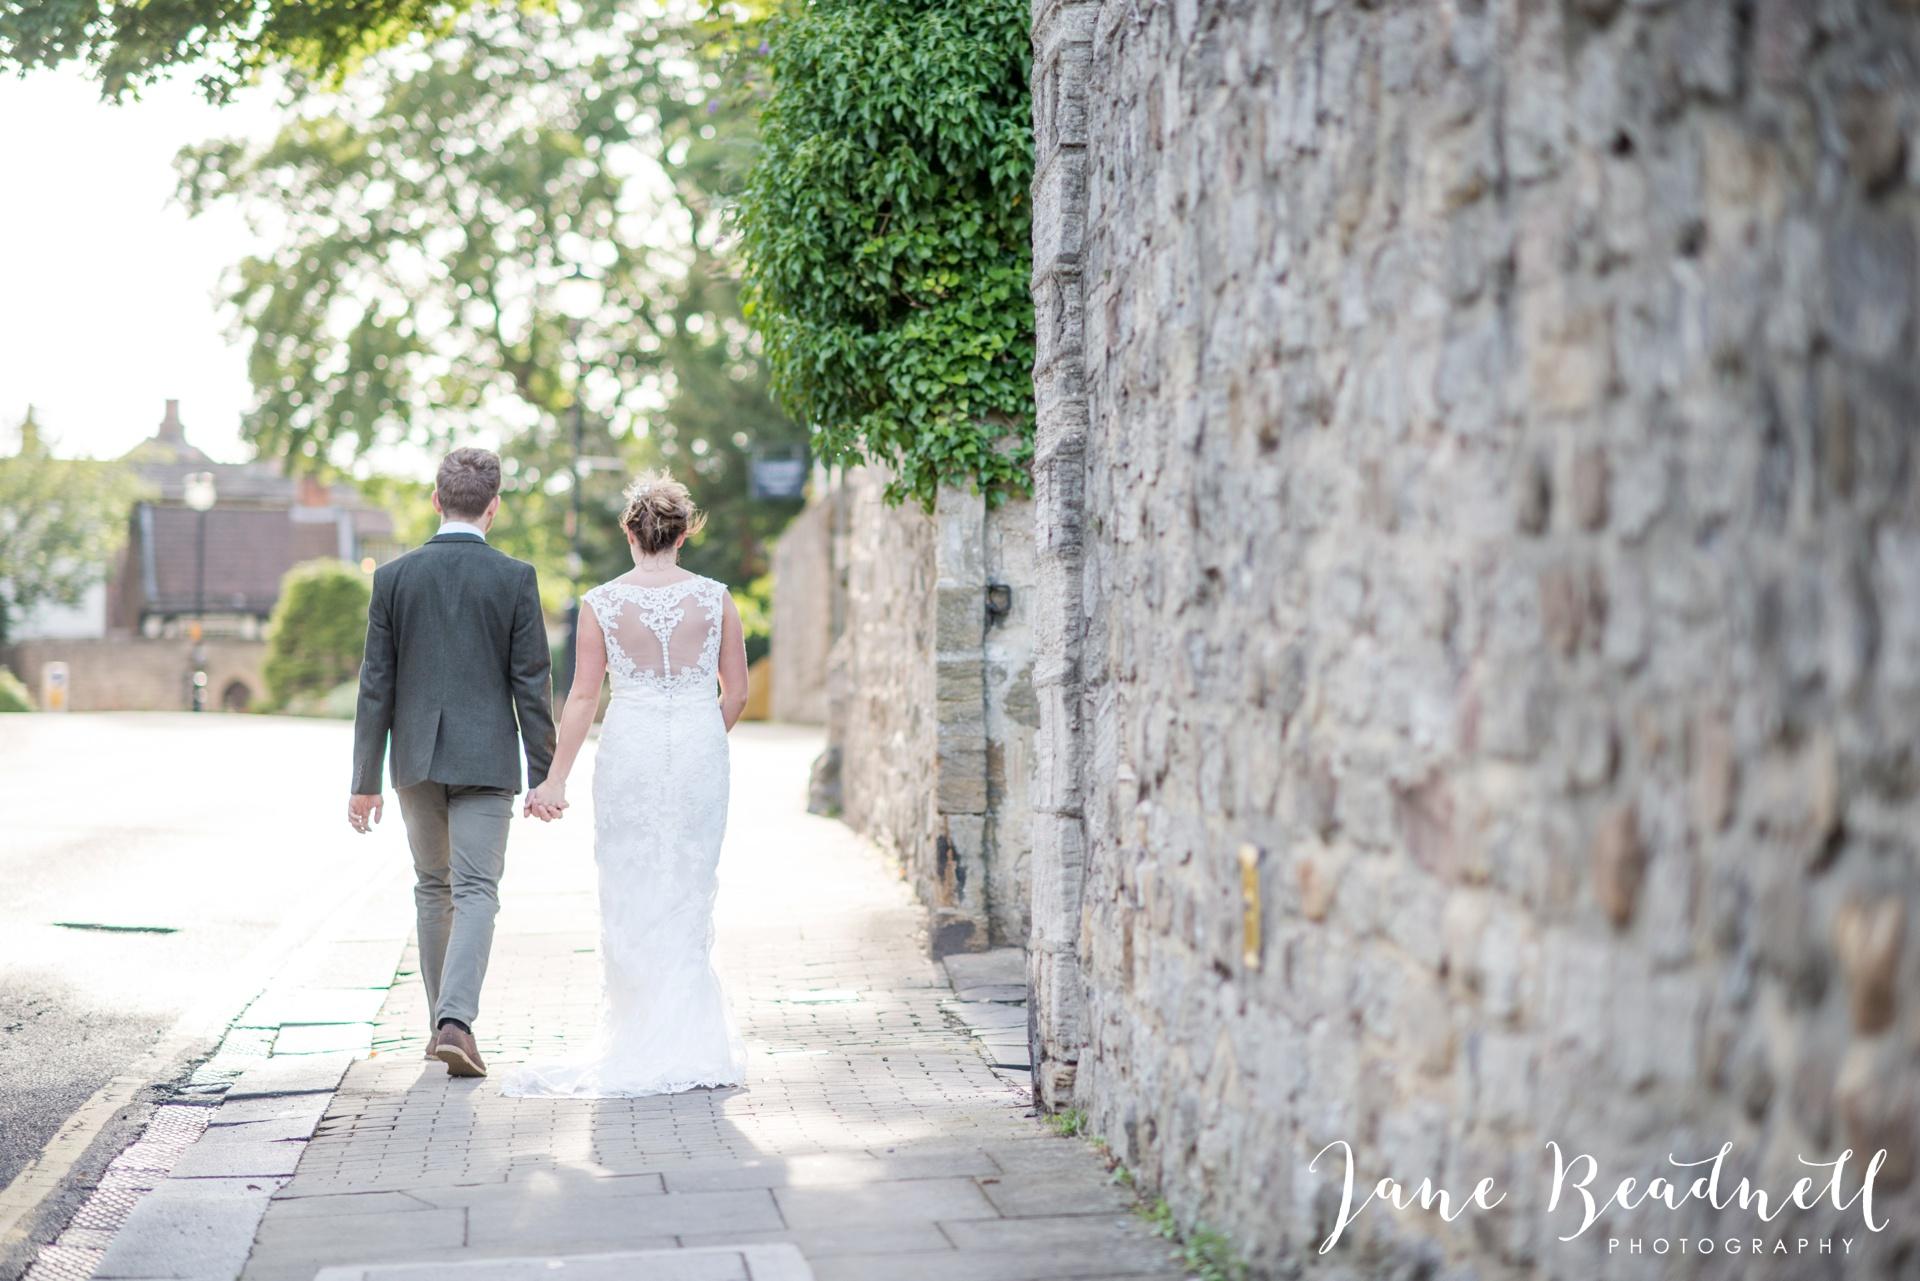 Jane Beadnell fine art wedding photographer The Old Deanery Ripon_0090